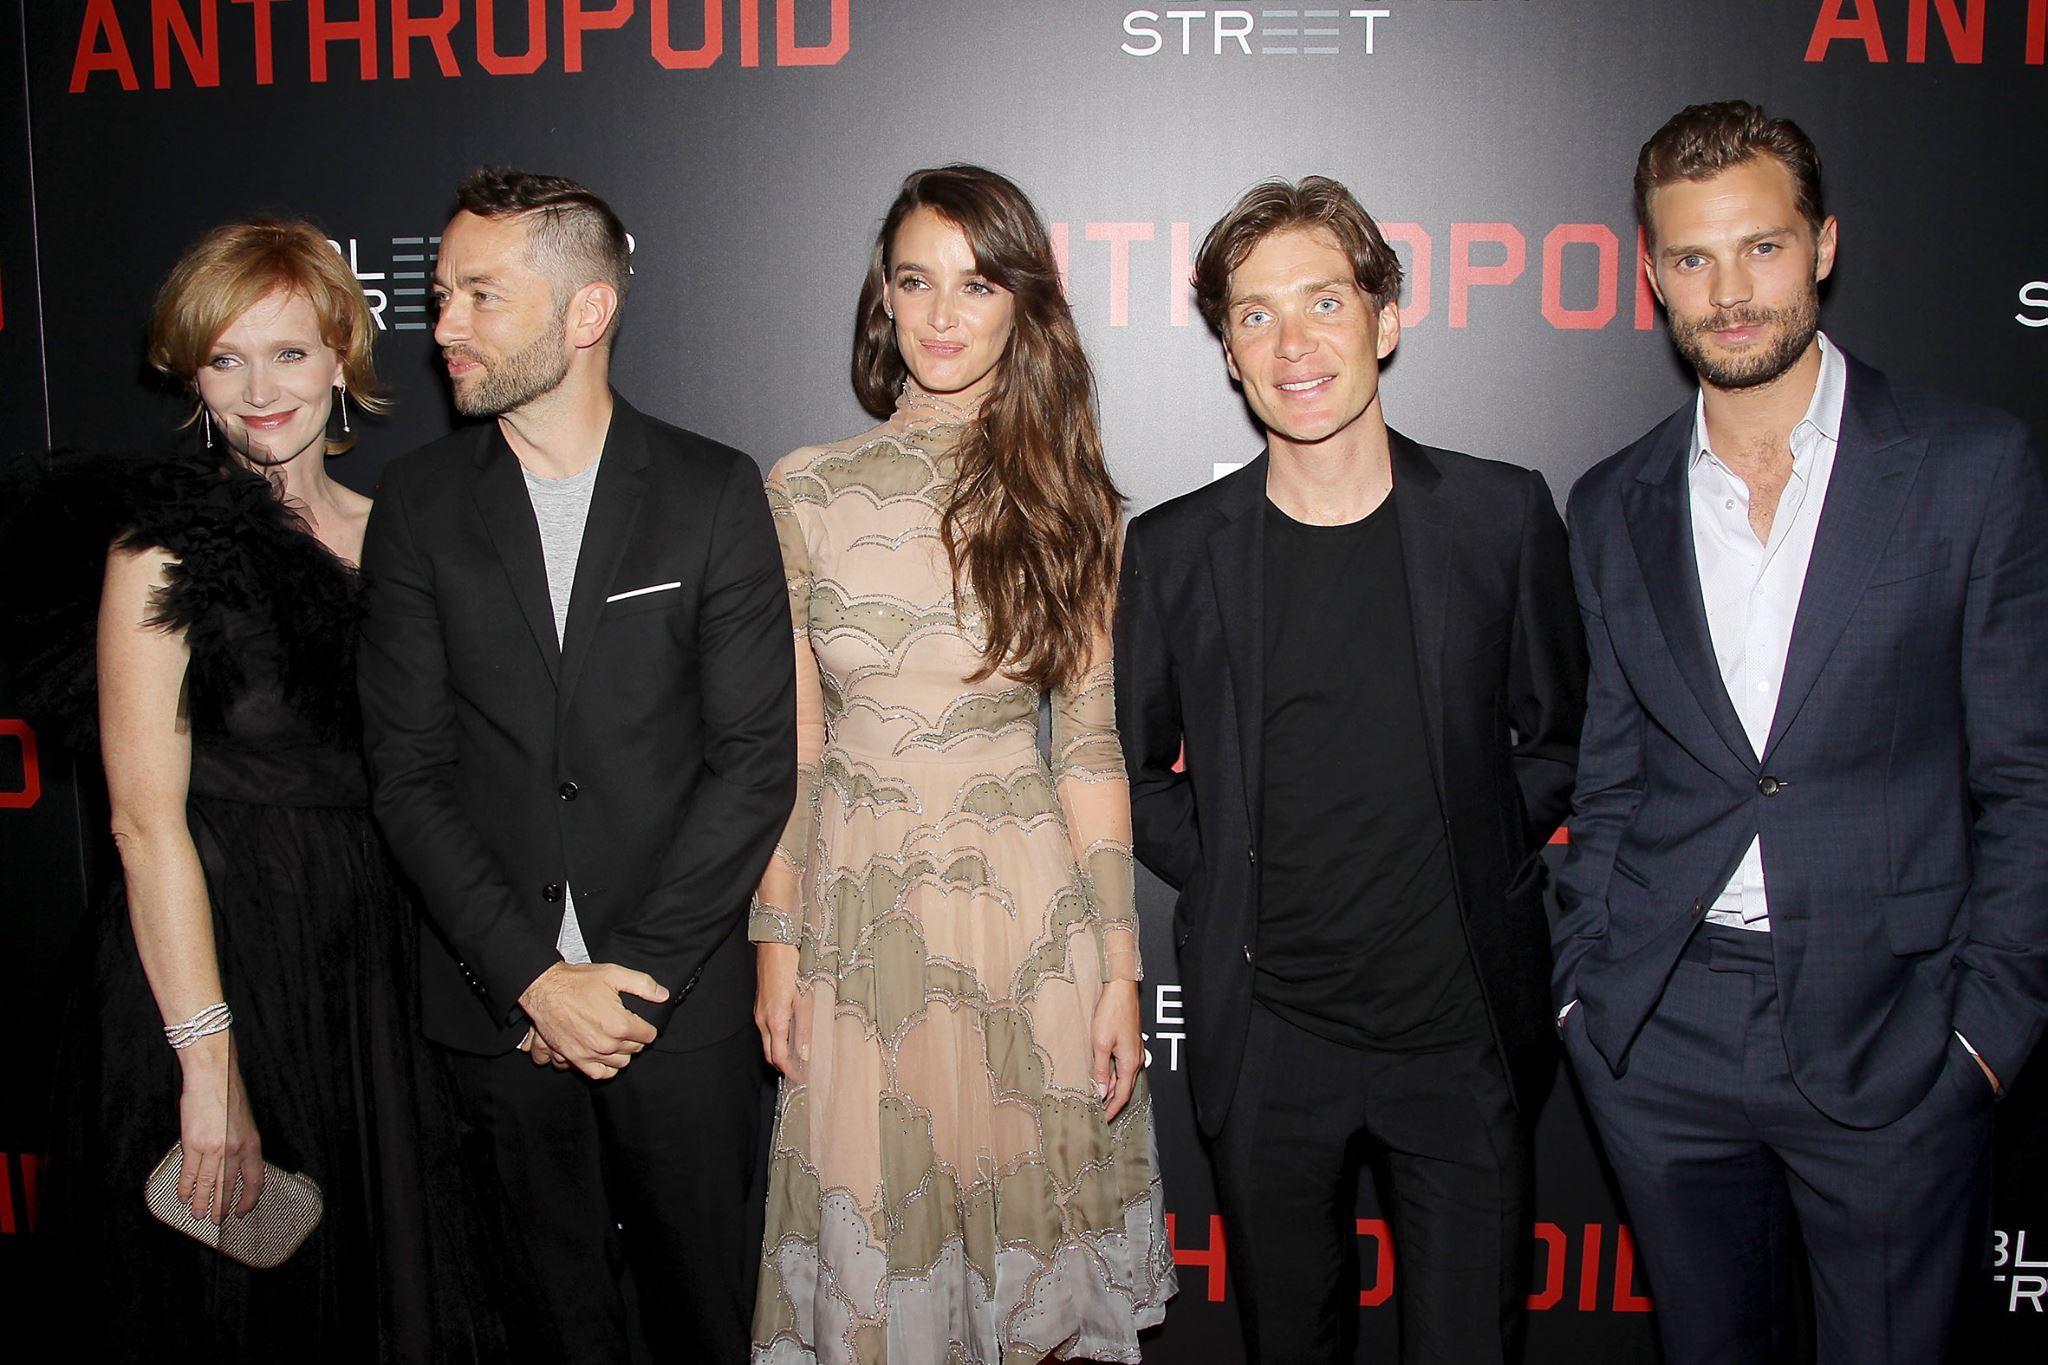 Ana Geislerova, director Sean Ellis, Charlotte Le Bon, Cillian Murphy, and Jamie Dornan.